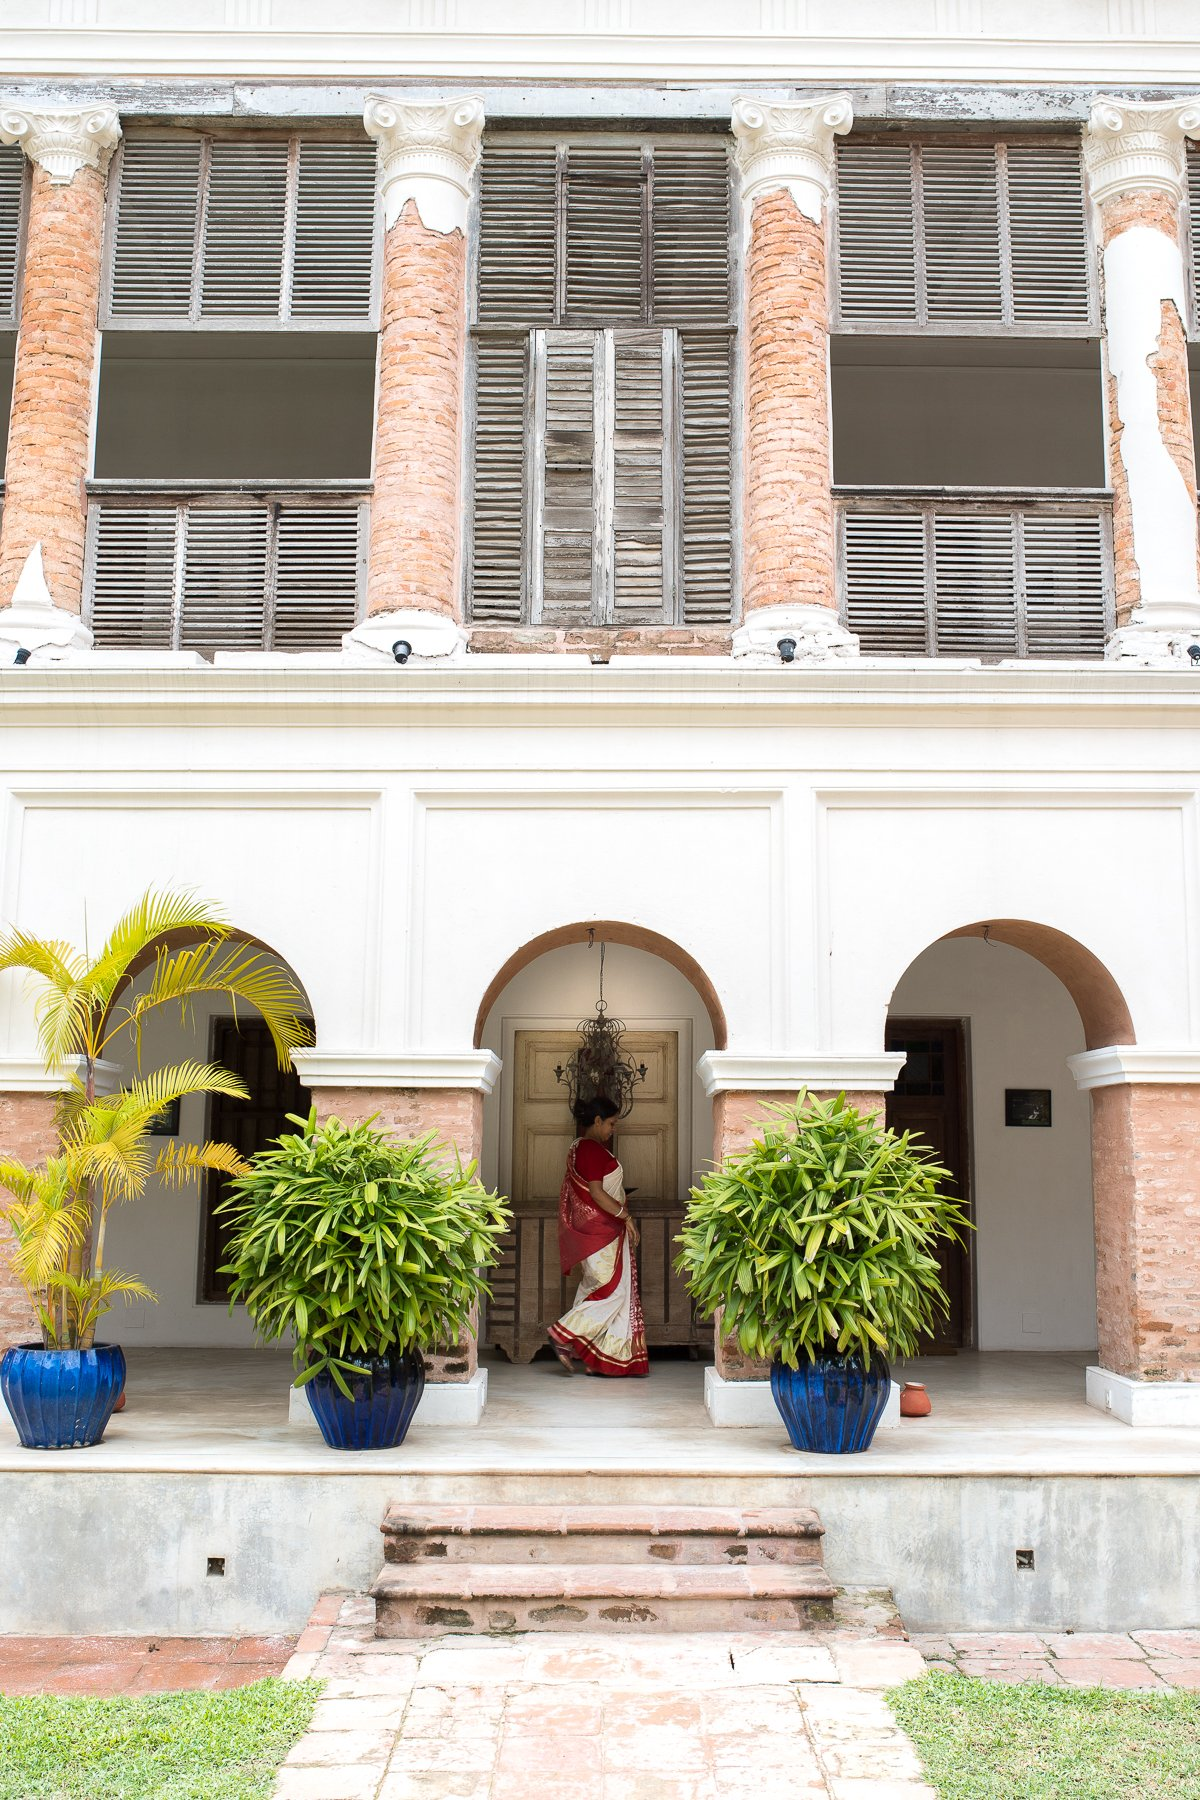 Stacie Flinner The Rajbari Bawali Heritage Hotel Calcutta-38.jpg